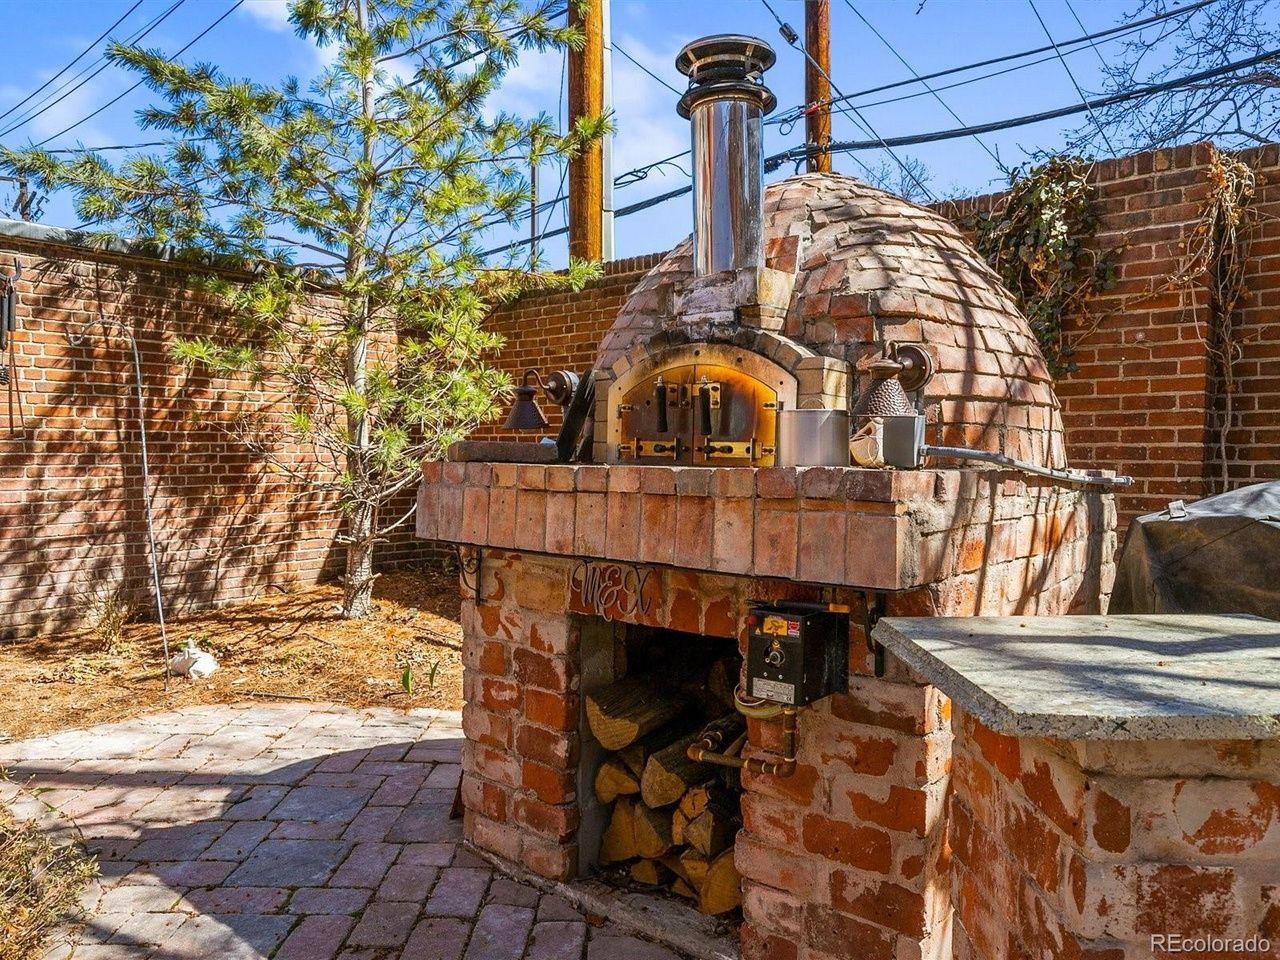 1350 N. Logan St pizza oven